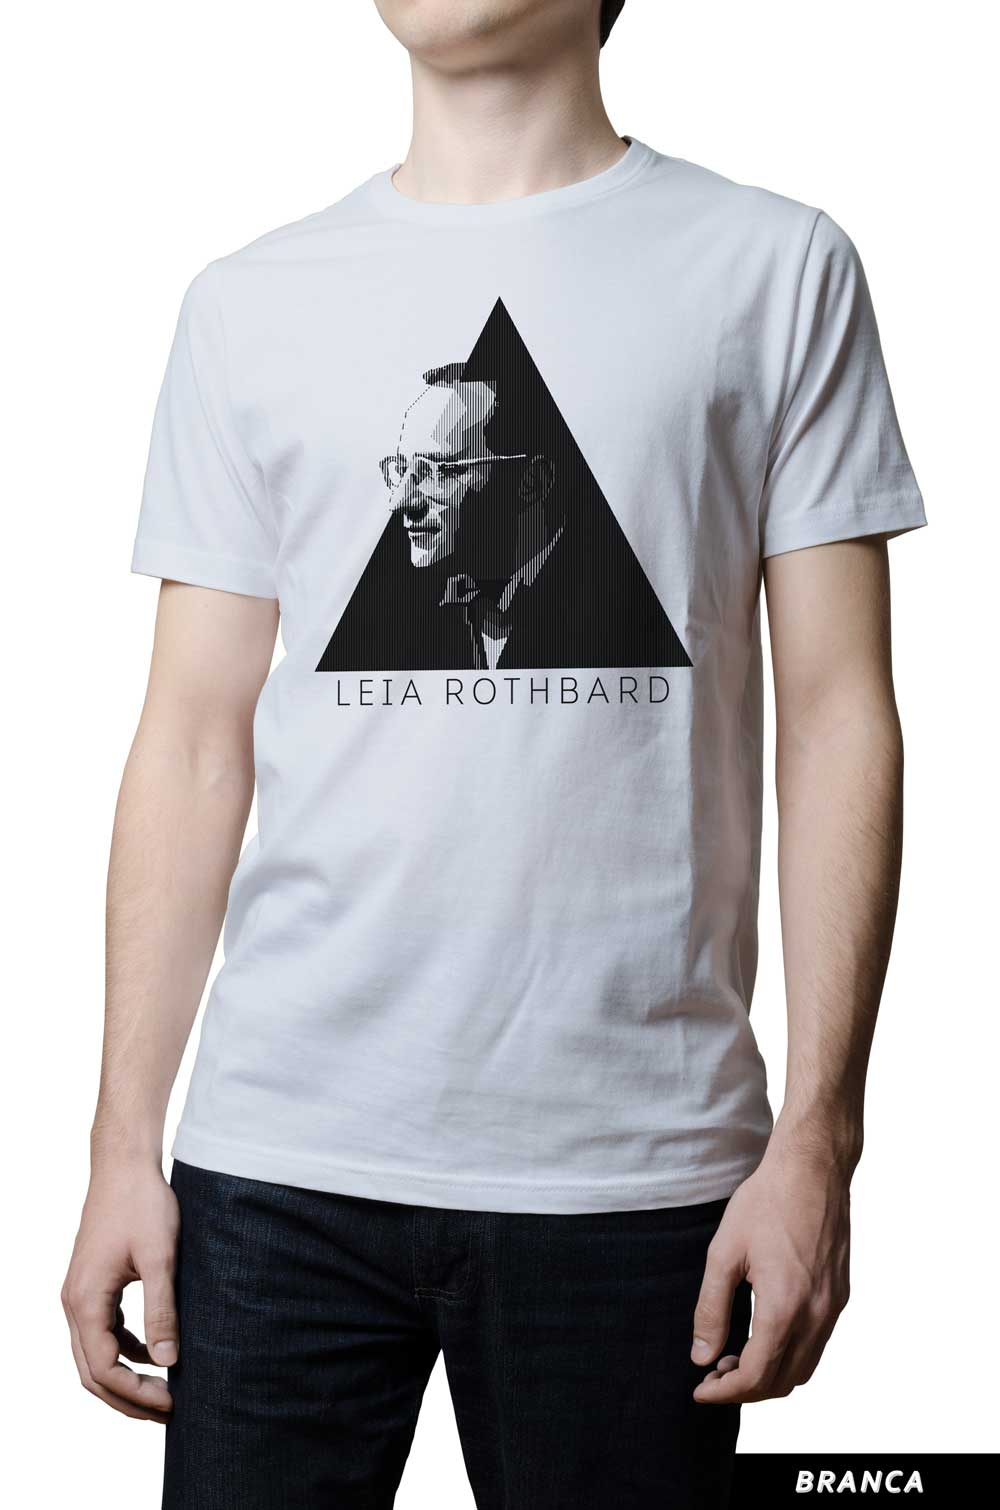 Camiseta - Leia Rothbard